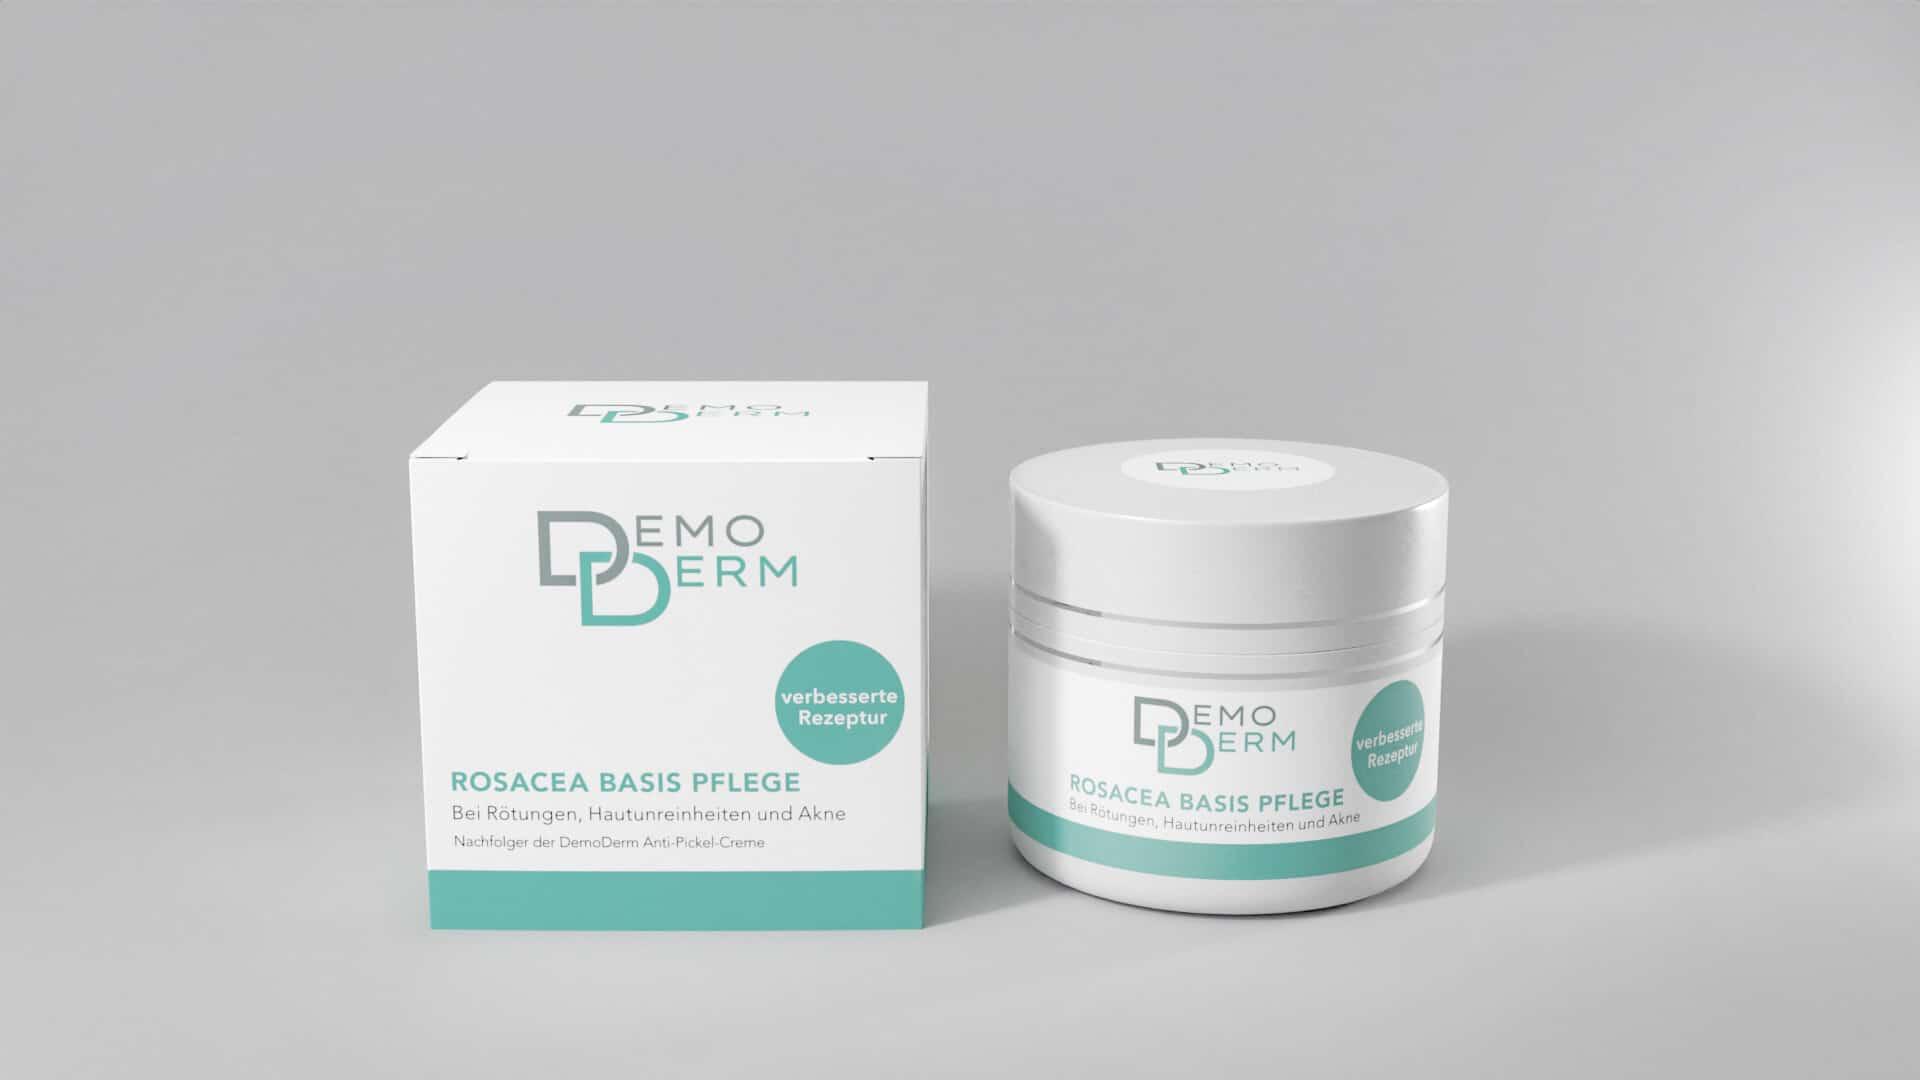 DemoDerm Rosacea Basis Pflege 20 g